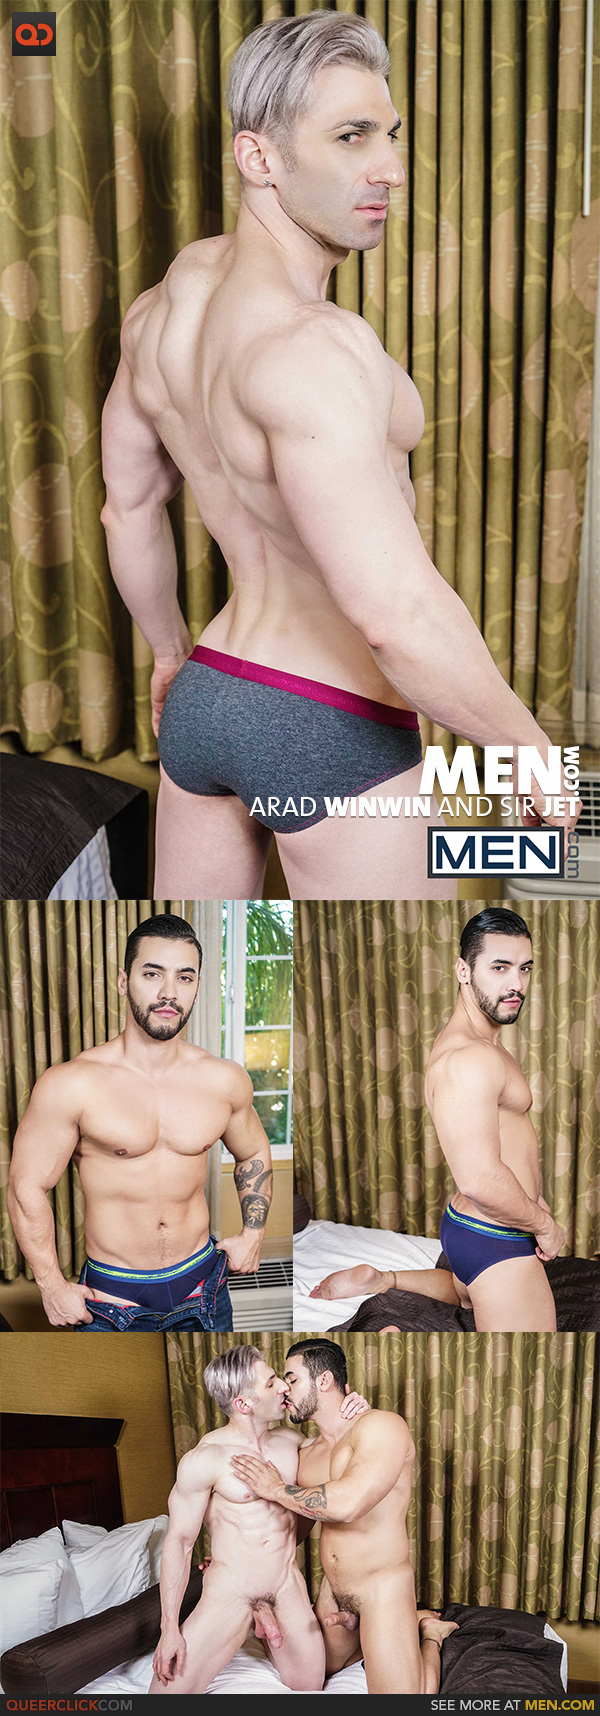 Men.com:  Arad Winwin and Sir Jet